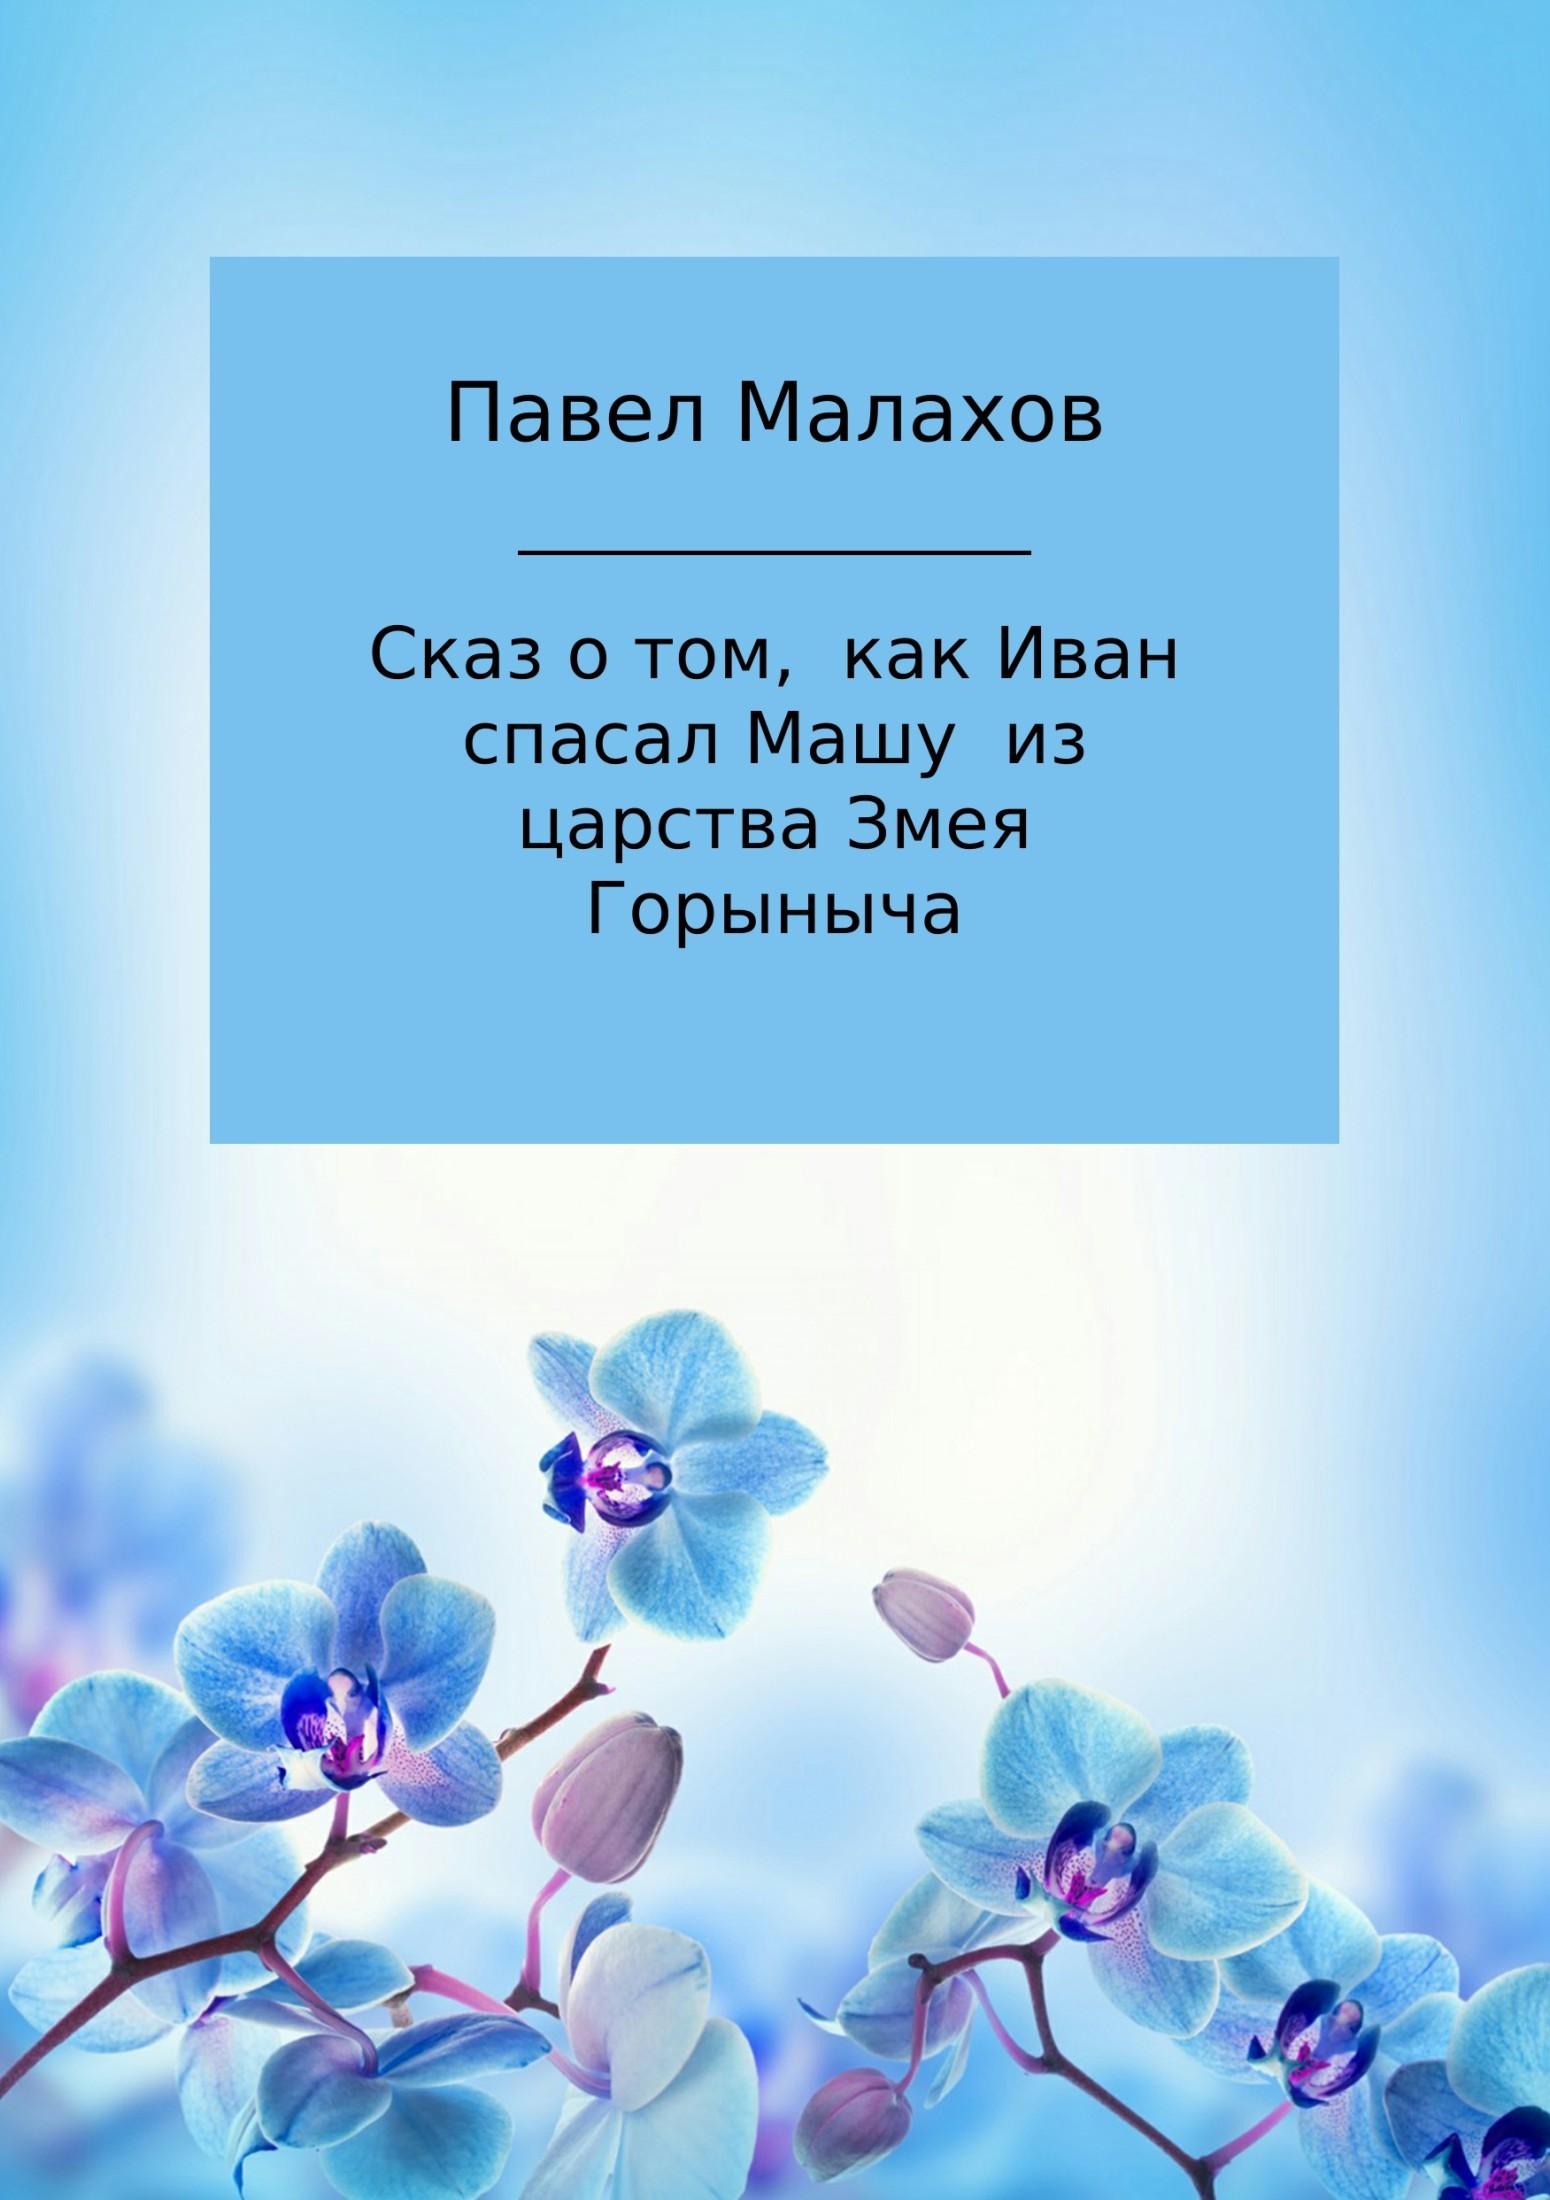 Павел Николаевич Малахов Сказ о том, как Иван спасал Машу из царства Змея Горыныча